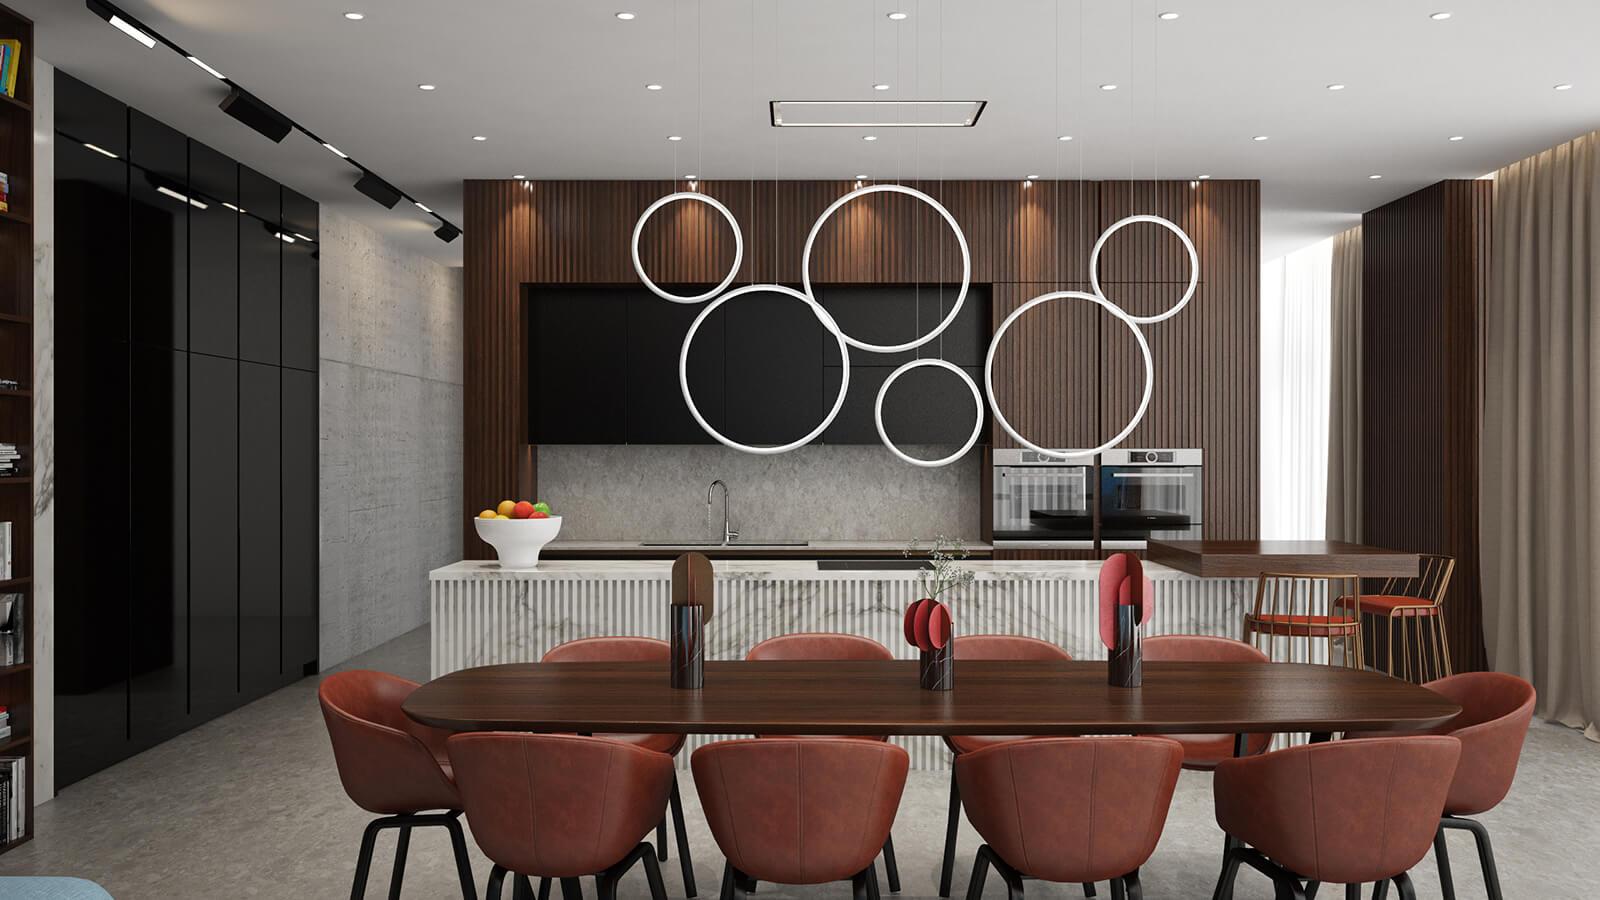 proekt-interioren-dizain-studio-vsekidnevna